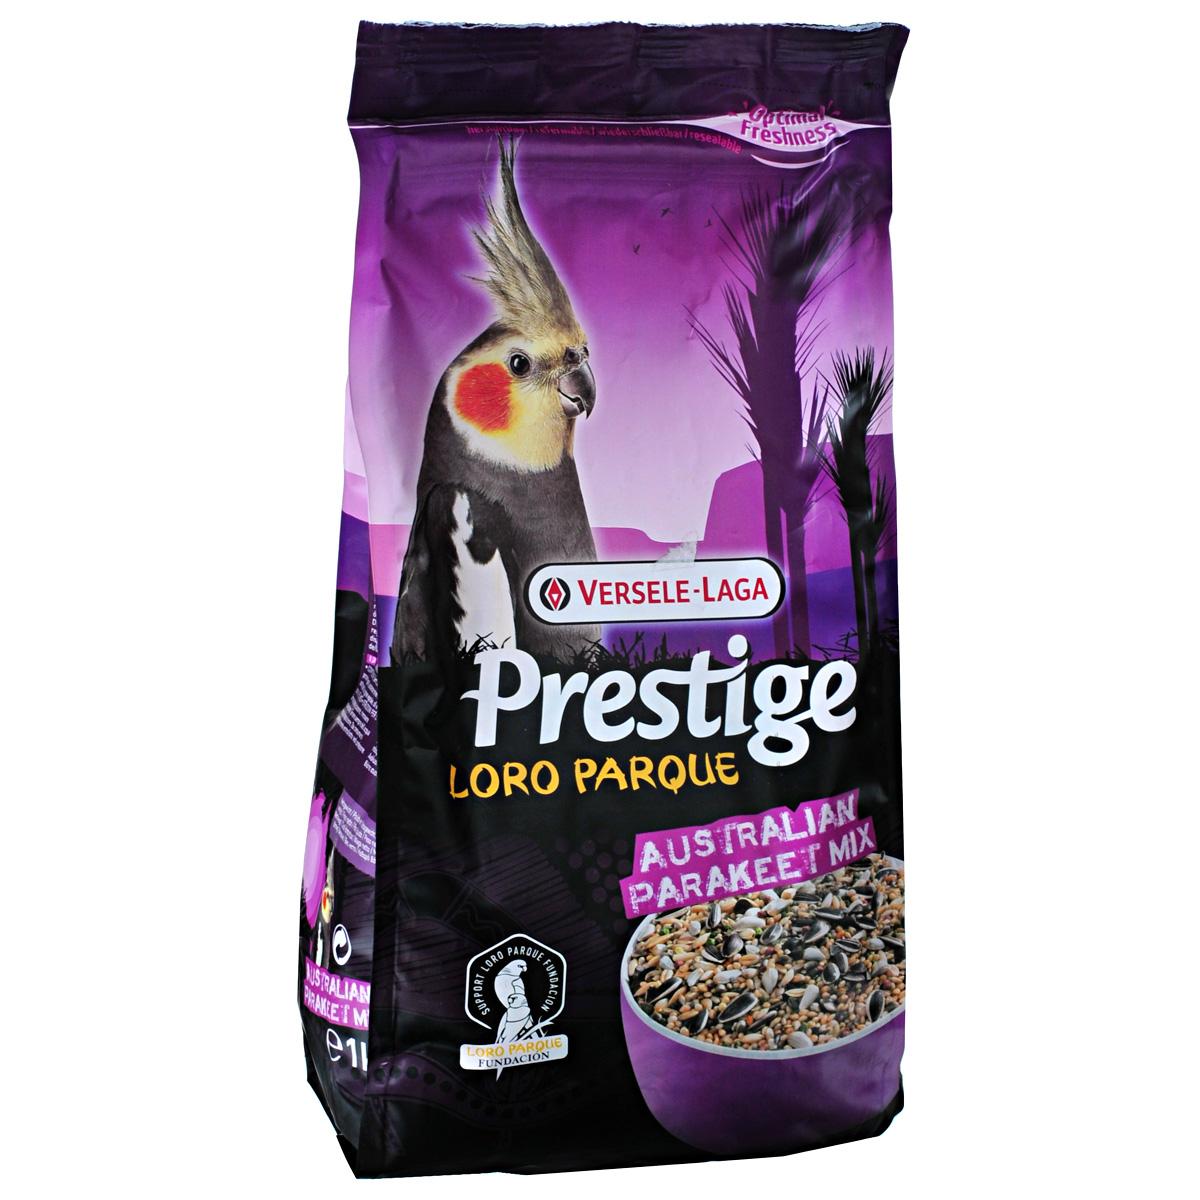 Корм для средних австралийских попугаев Versele-Laga Australian Parakeet, 1 кг triol корм для мелких и средних попугаев с мёдом